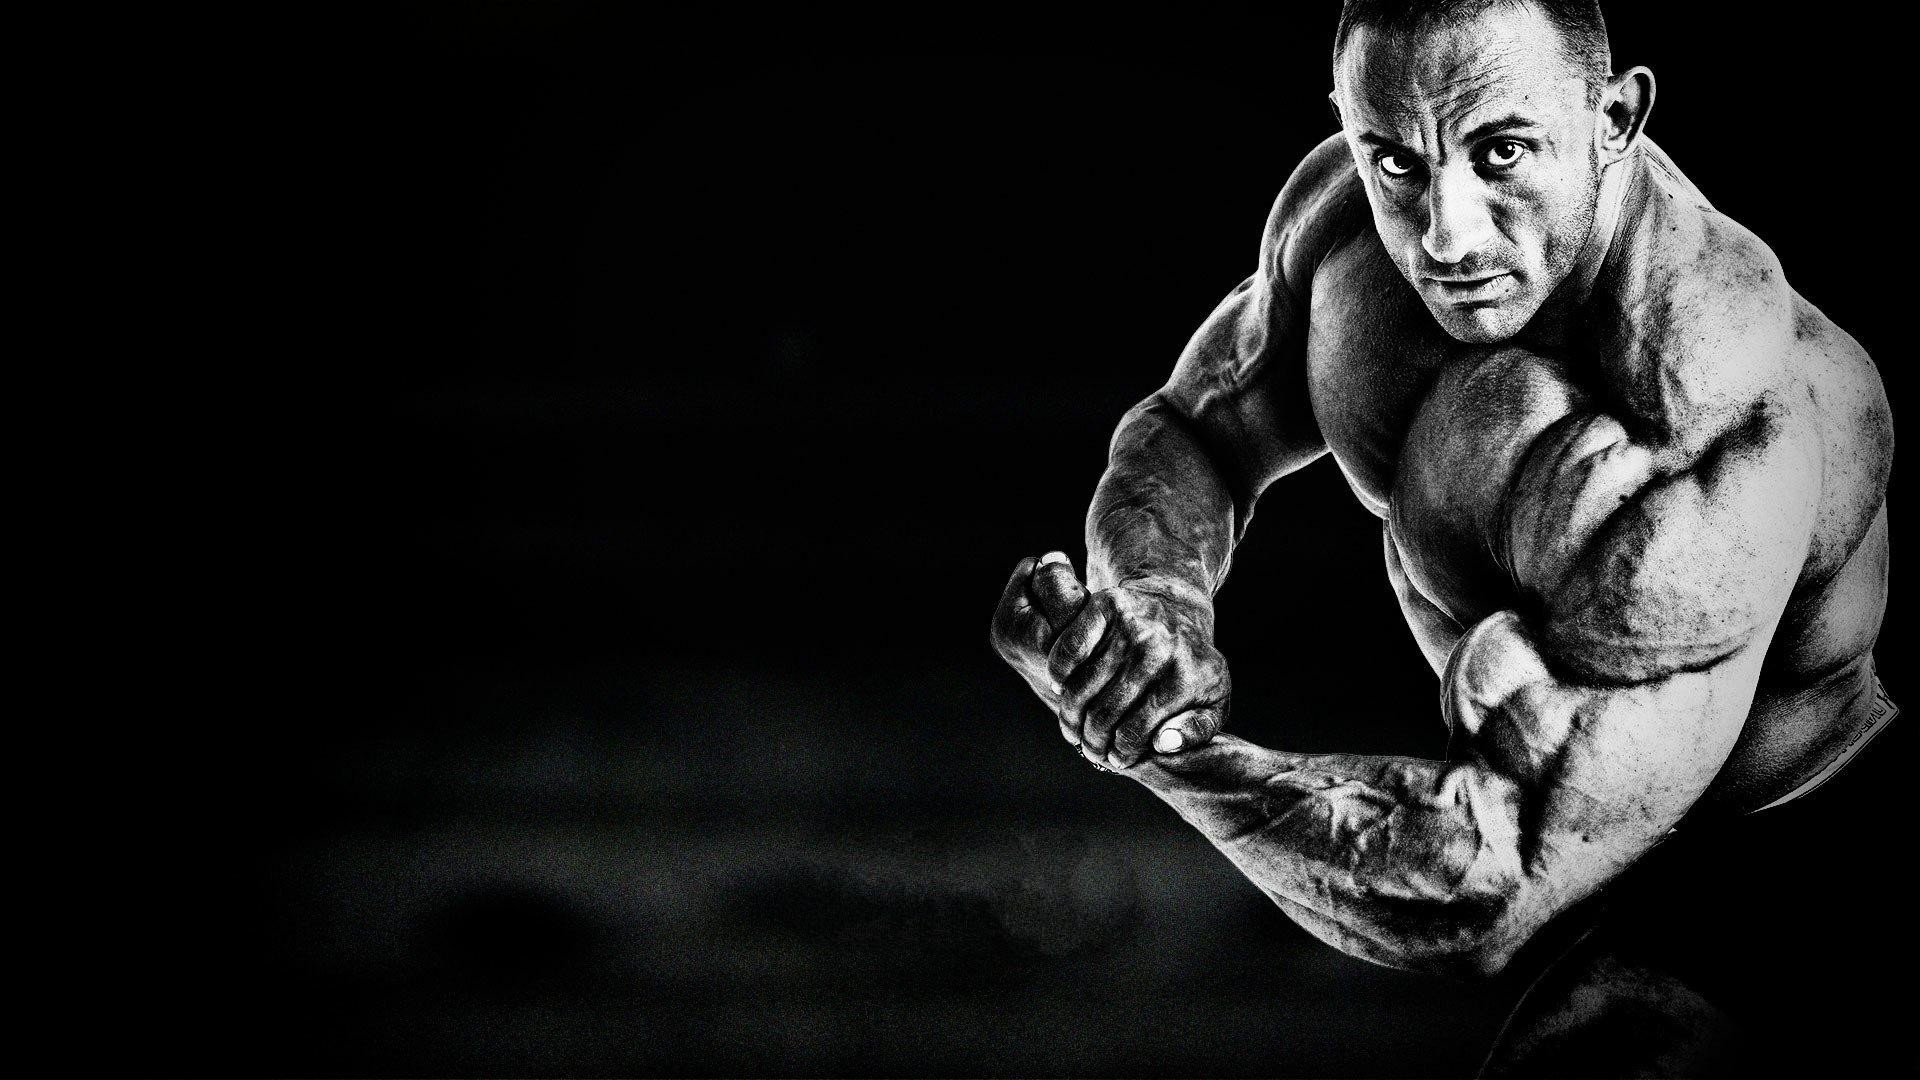 wallpaper.wiki-Bodybuilding-Photo-HD-PIC-WPE0010038